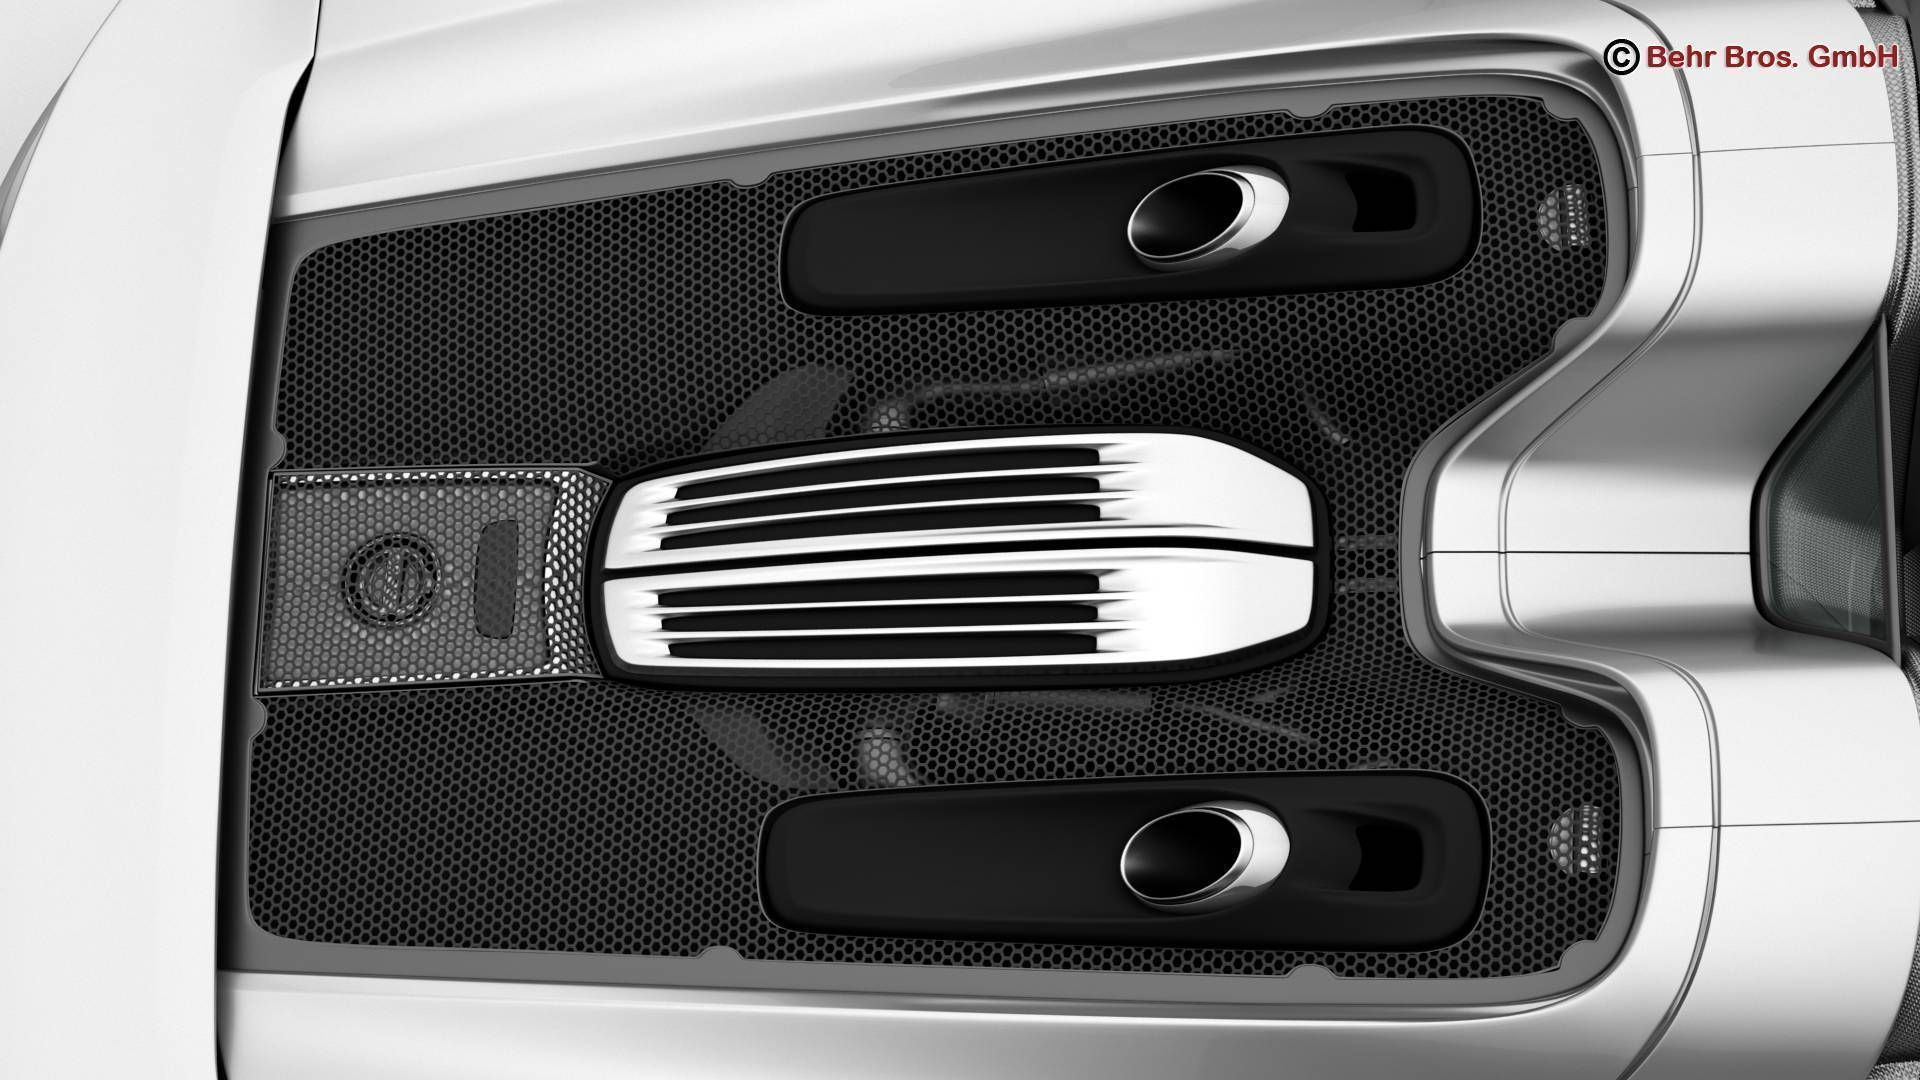 porsche 918 spyder including detachable roof 3d model max obj 3ds fbx c4d lwo. Black Bedroom Furniture Sets. Home Design Ideas